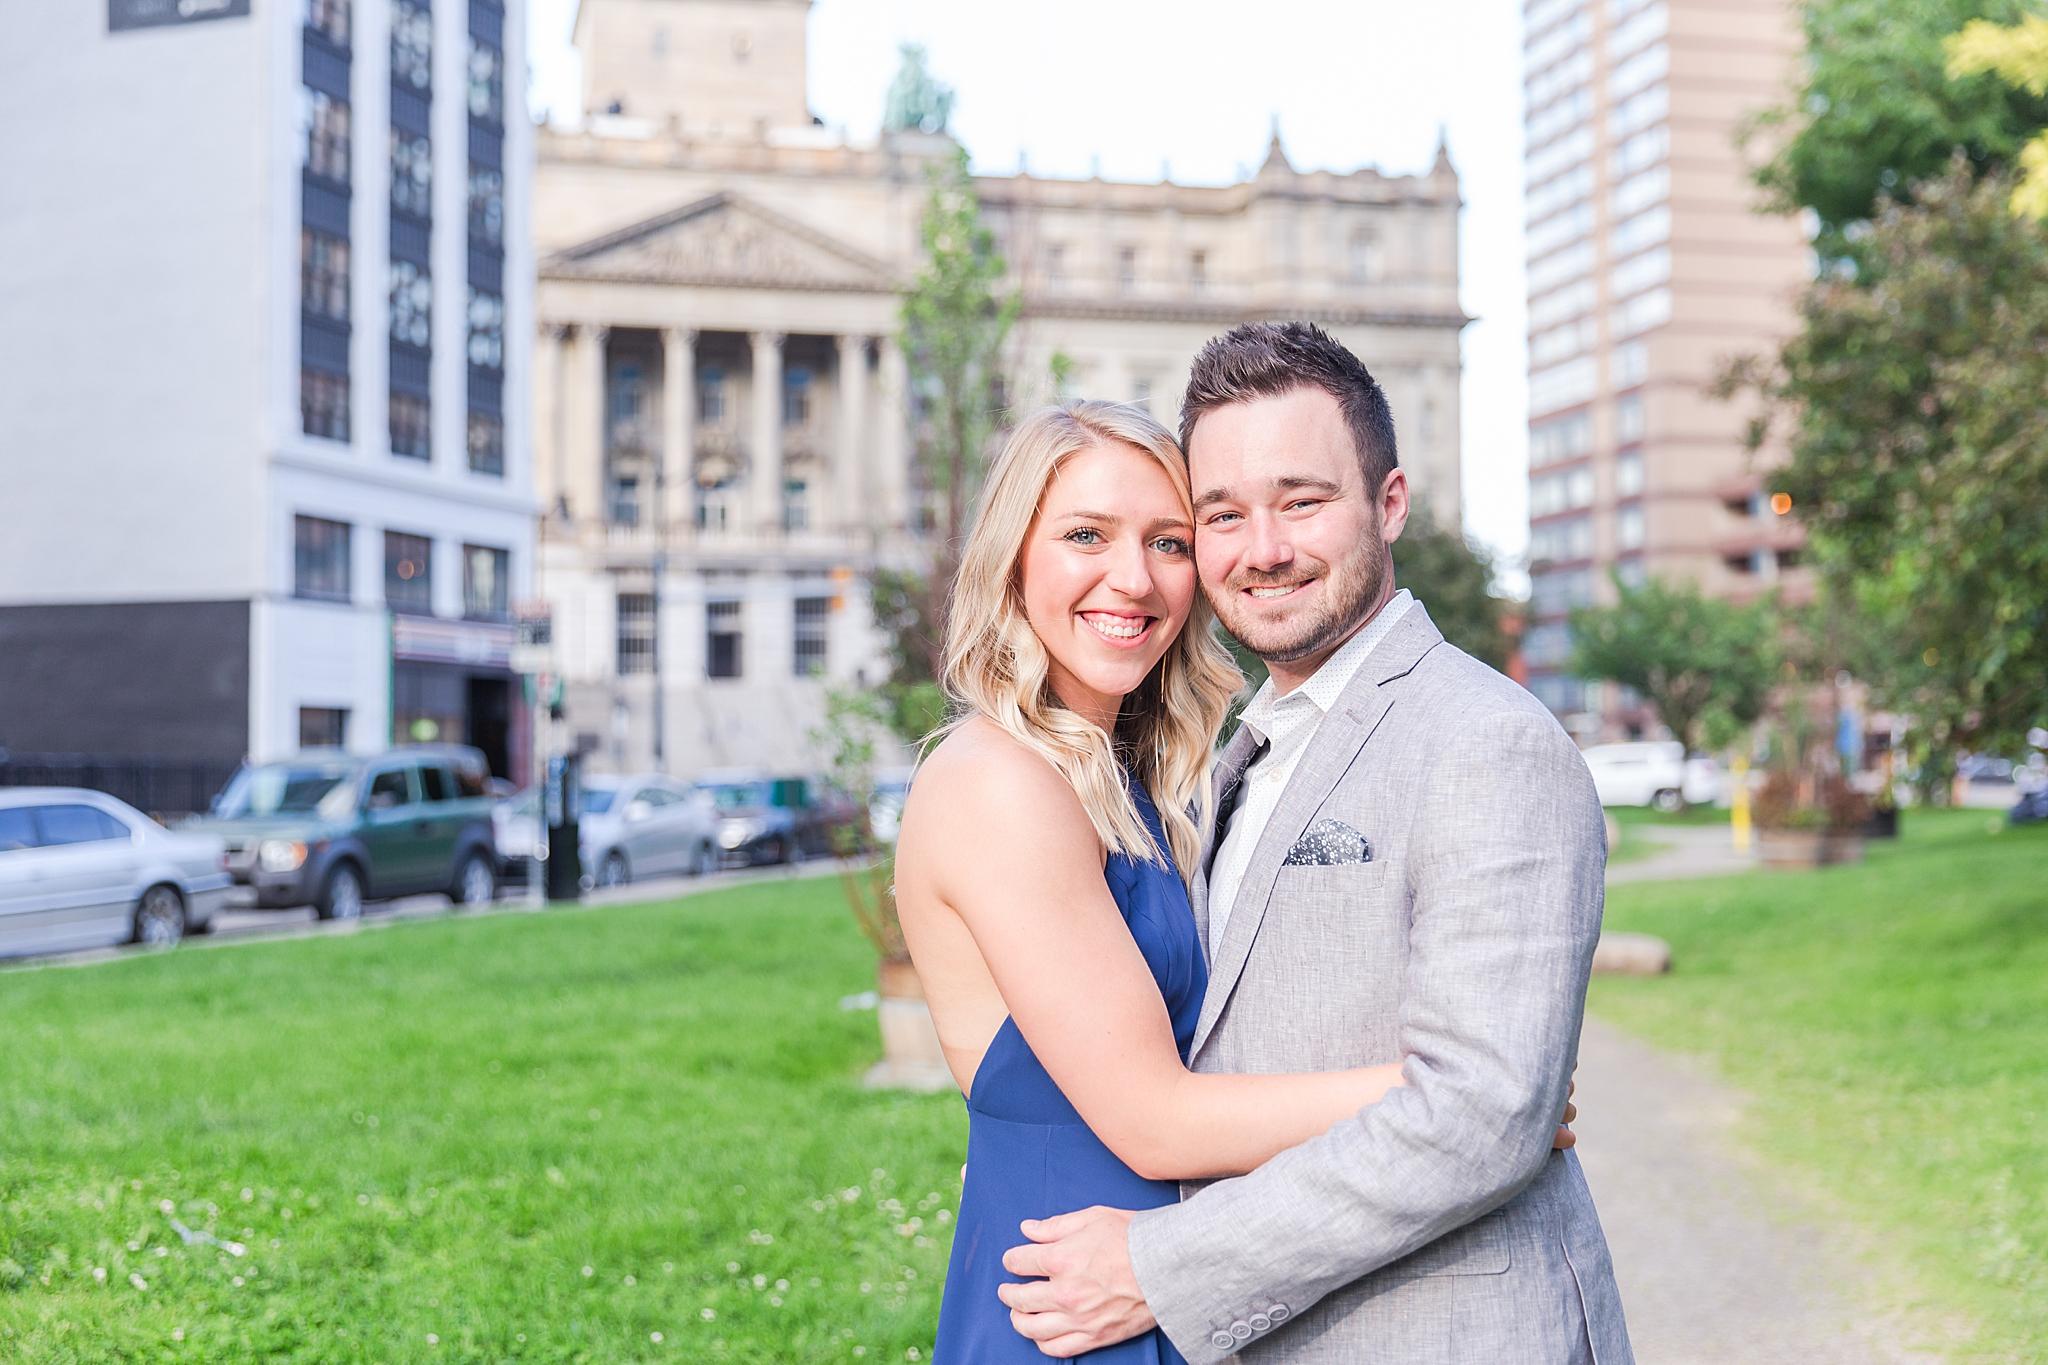 detroit-wedding-photographer-downtown-detroit-belle-isle-engagement-photos-sarah-eric-by-courtney-carolyn-photography_0026.jpg